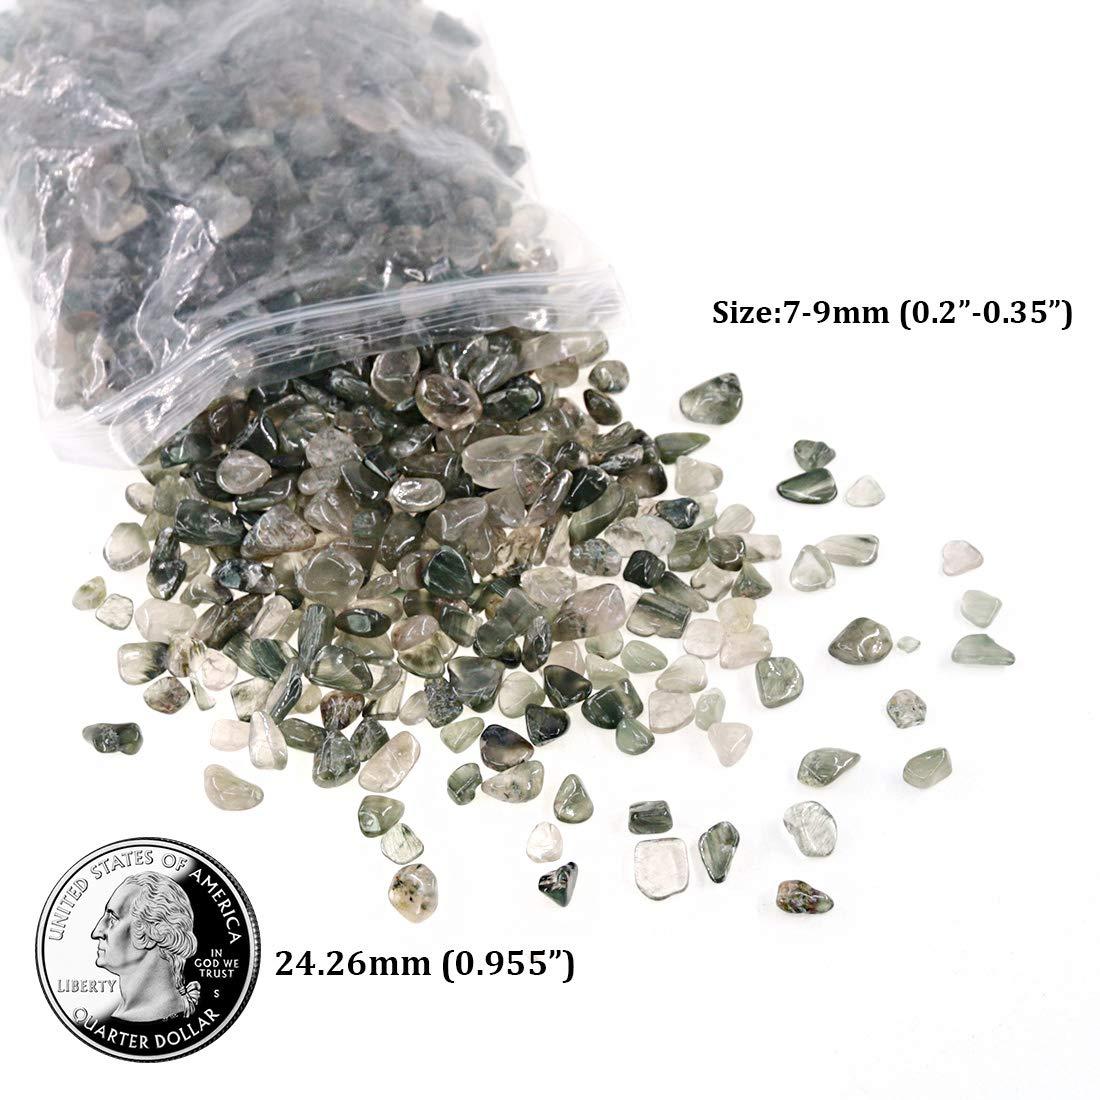 About 1lb //Bag Hilitchi Quartz Stones Tumbled Chips Stone Crushed Crystal Natural Rocks Healing Home Indoor Decorative Gravel Feng Shui Healing Stones 450g Green Strawberry Quartz